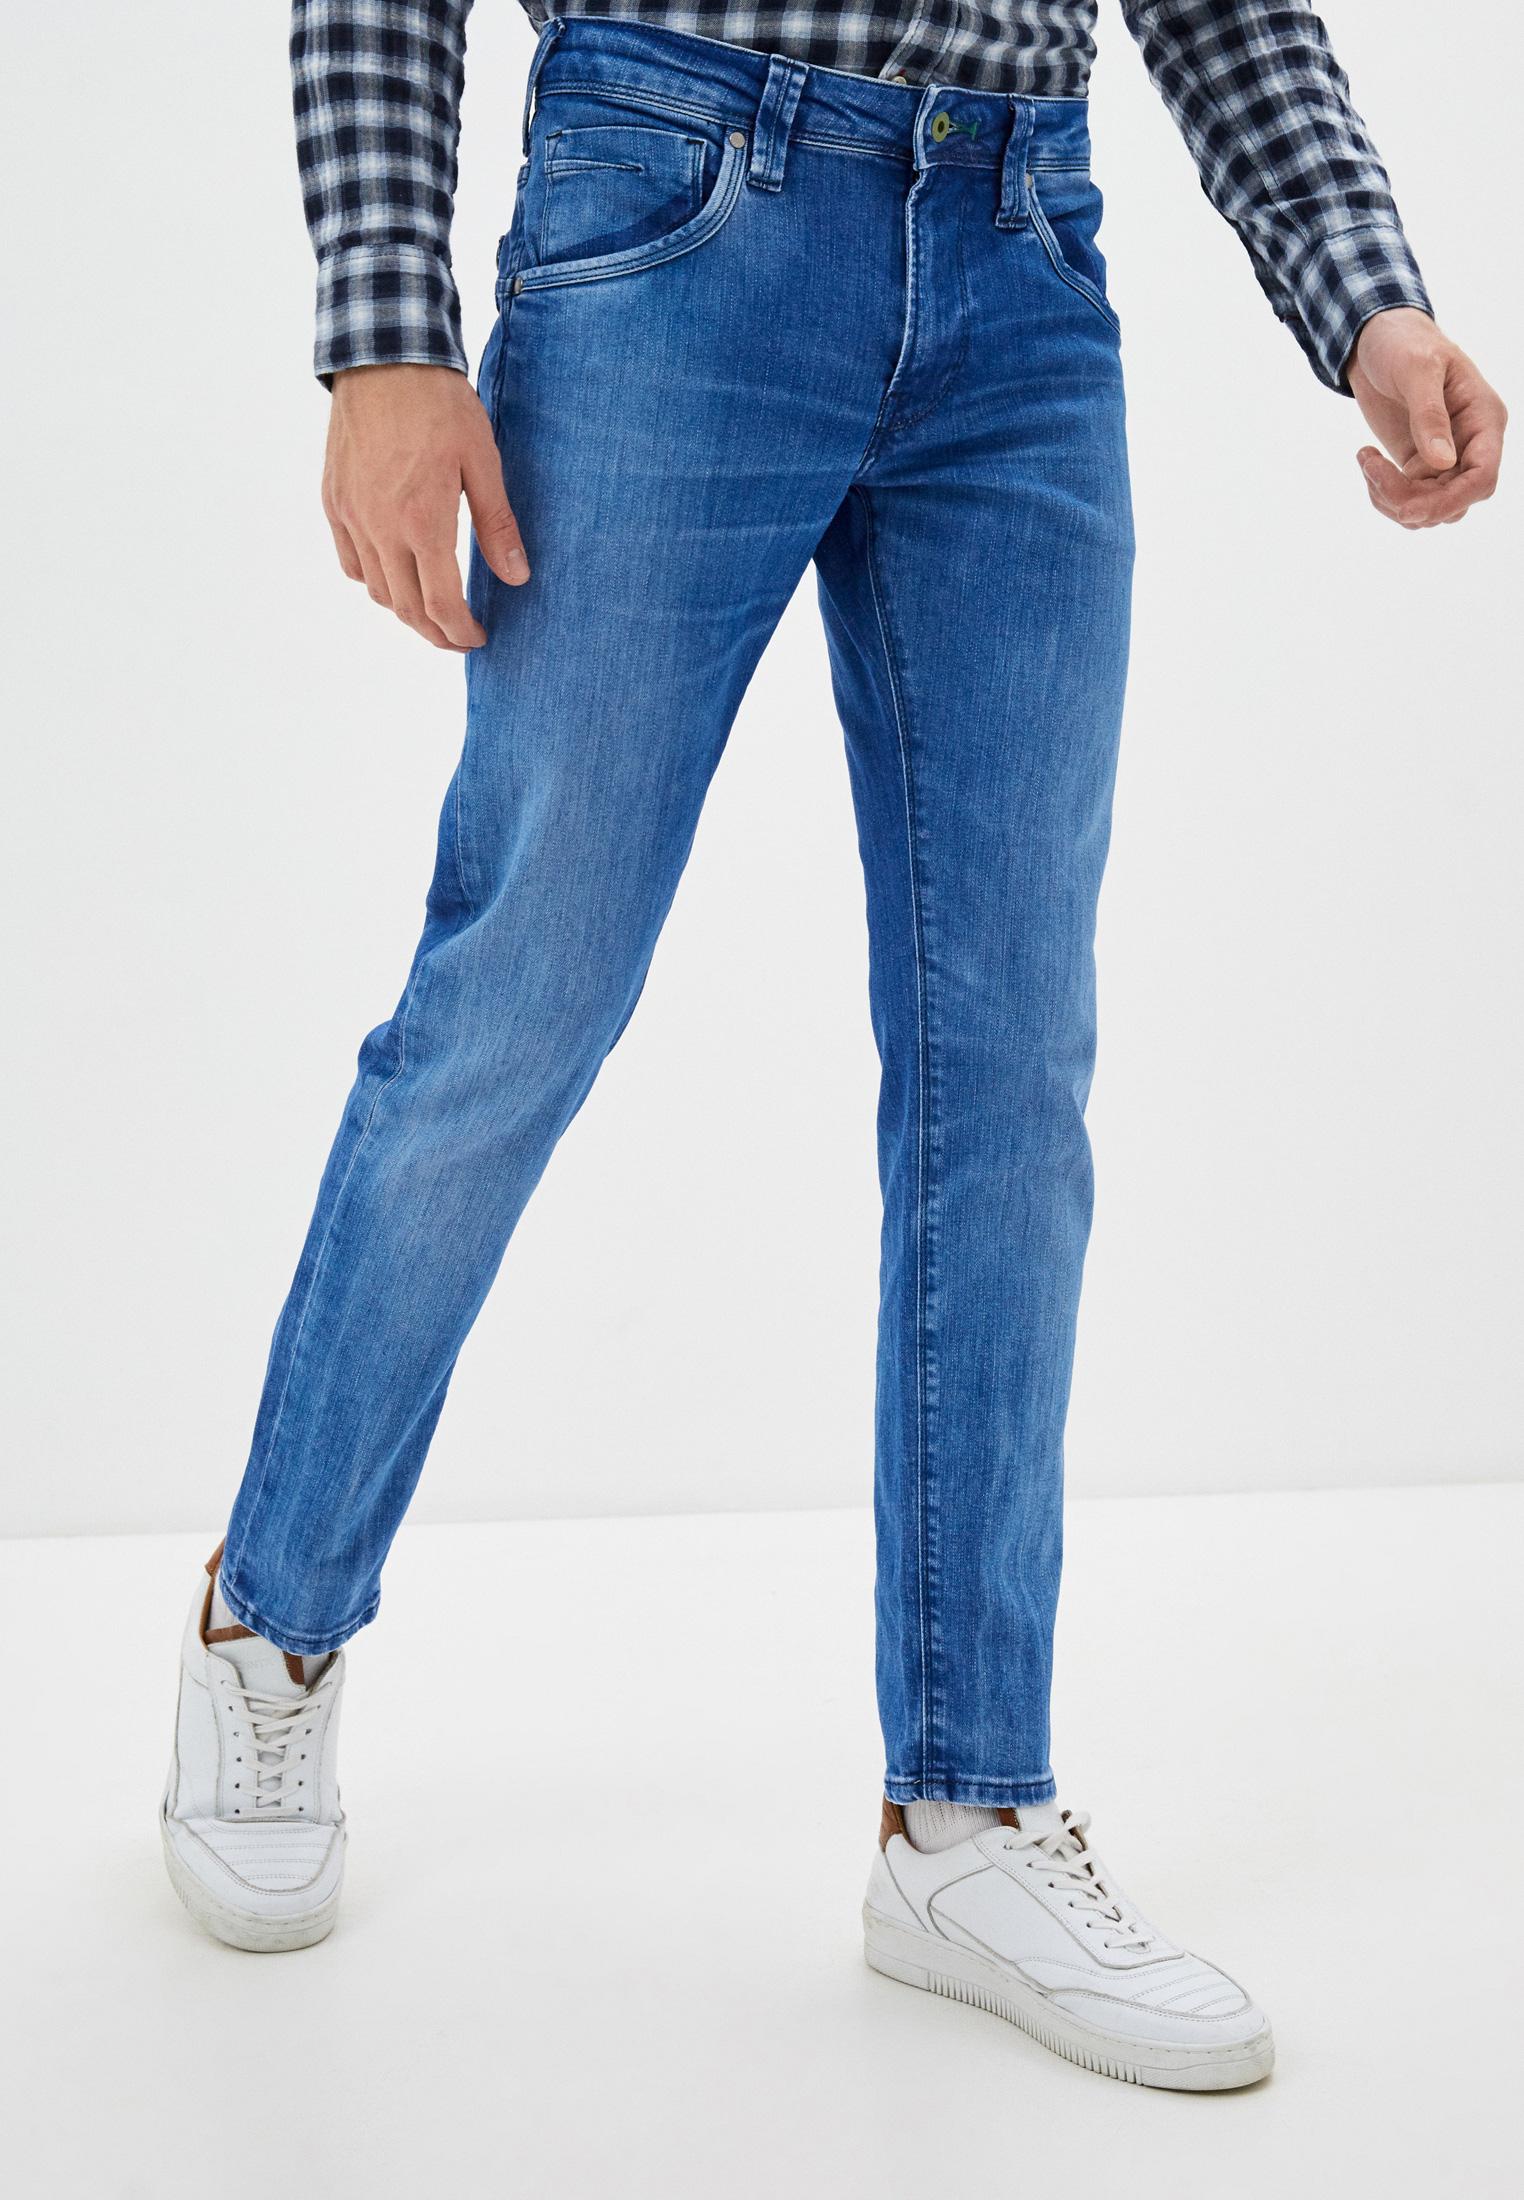 Зауженные джинсы Pepe Jeans (Пепе Джинс) PM201519WG4